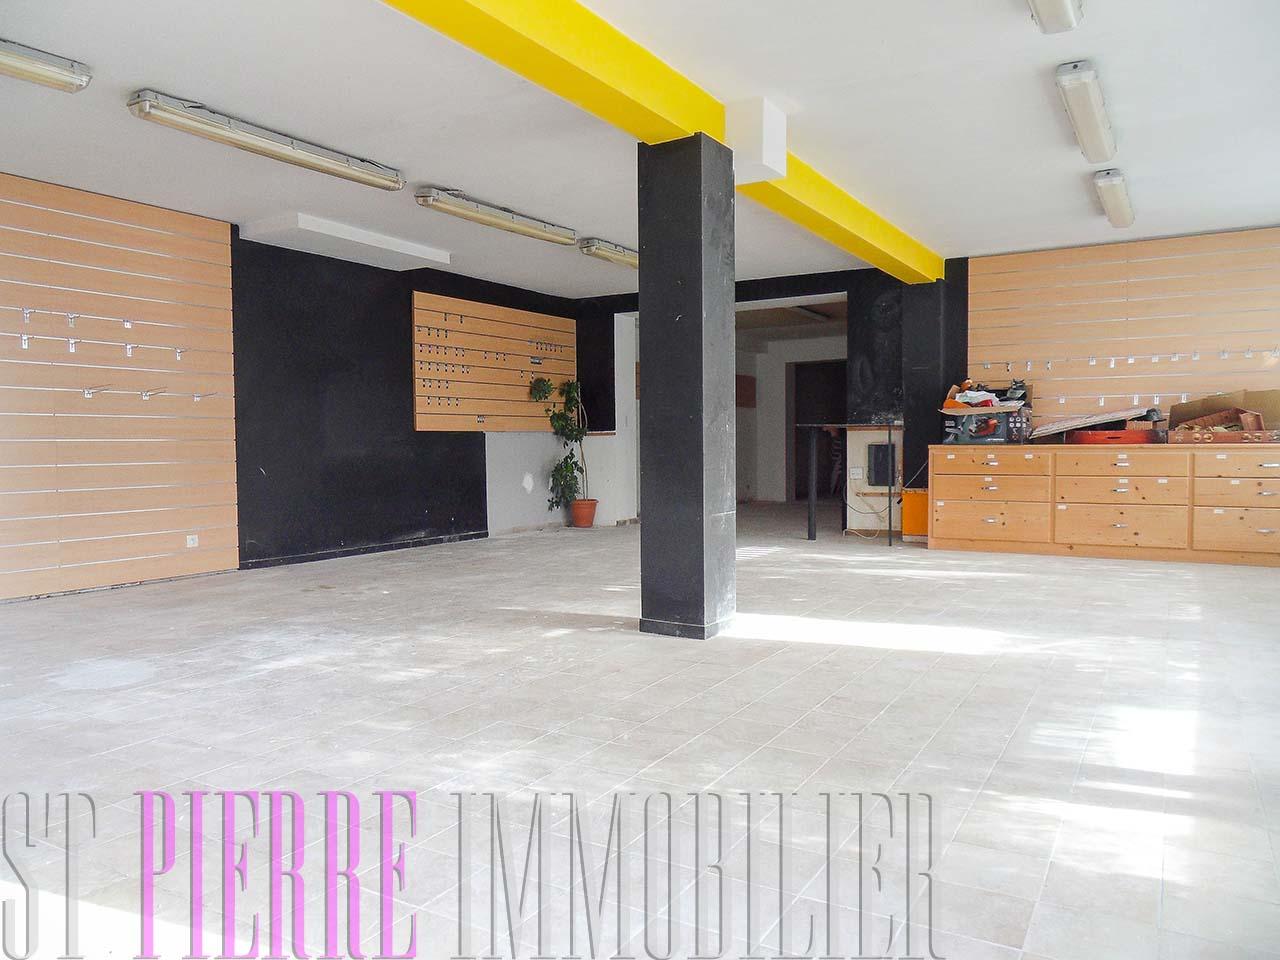 Louer local commecial rue de lattre de tassigny niort for Location de garage niort